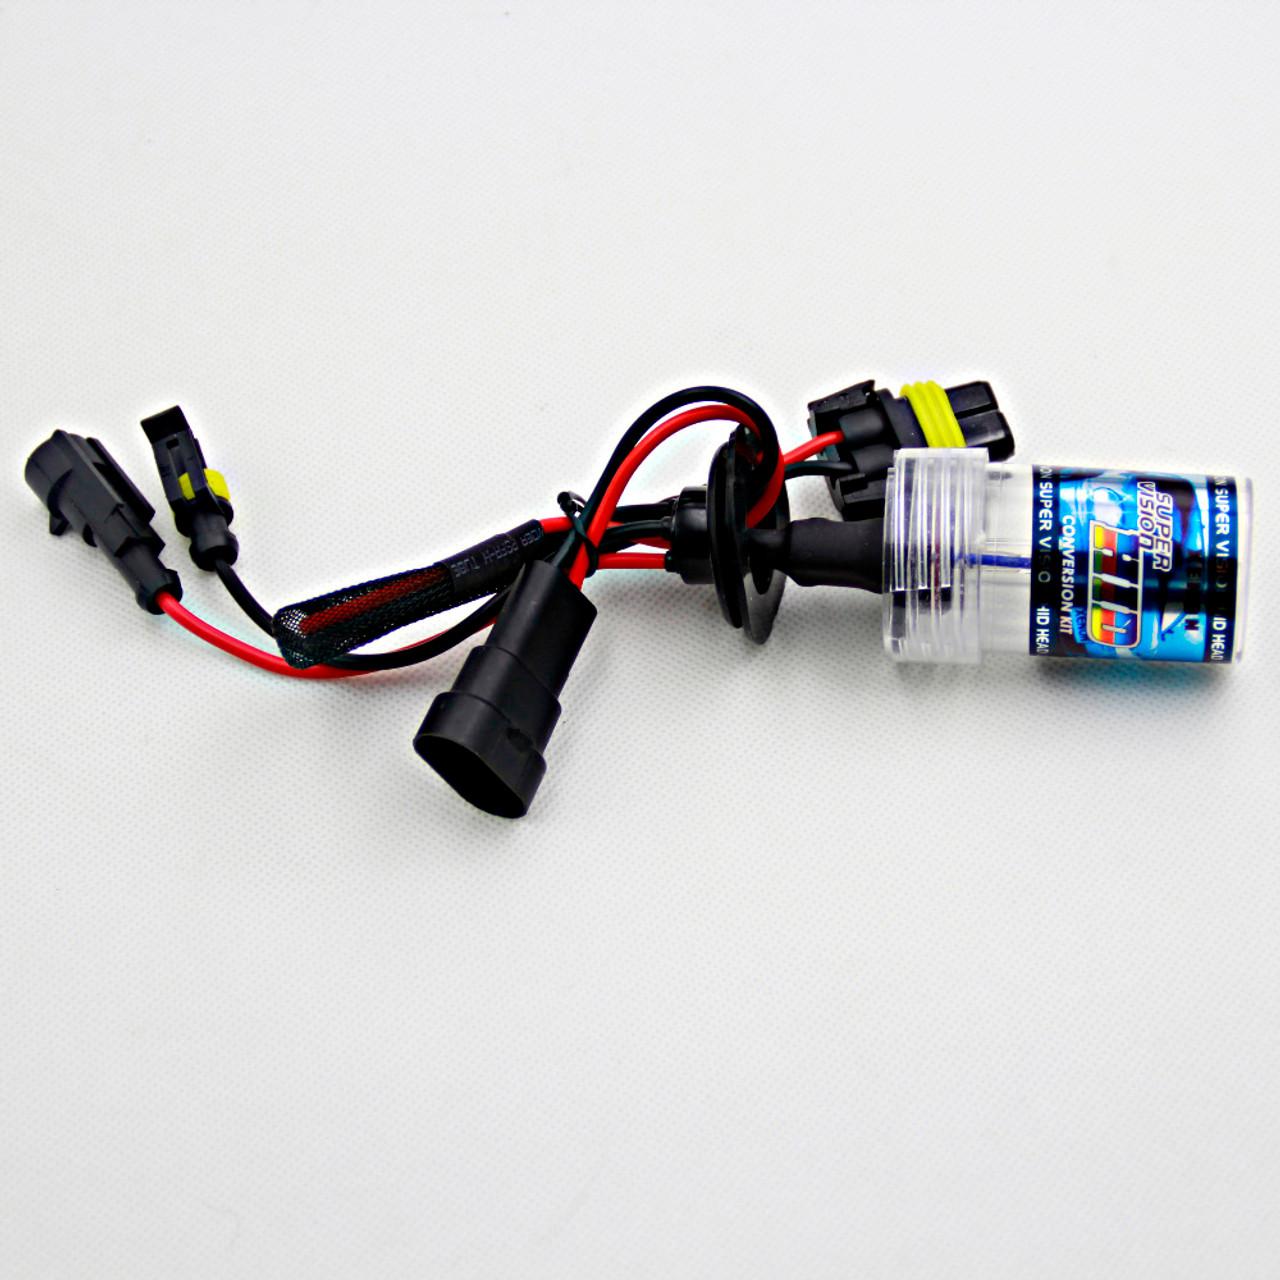 hight resolution of  crossfox 2pcs 55w xenon h1 h7 h11 h3 h13 9005 9006 9004 9007 880 headlight bulb